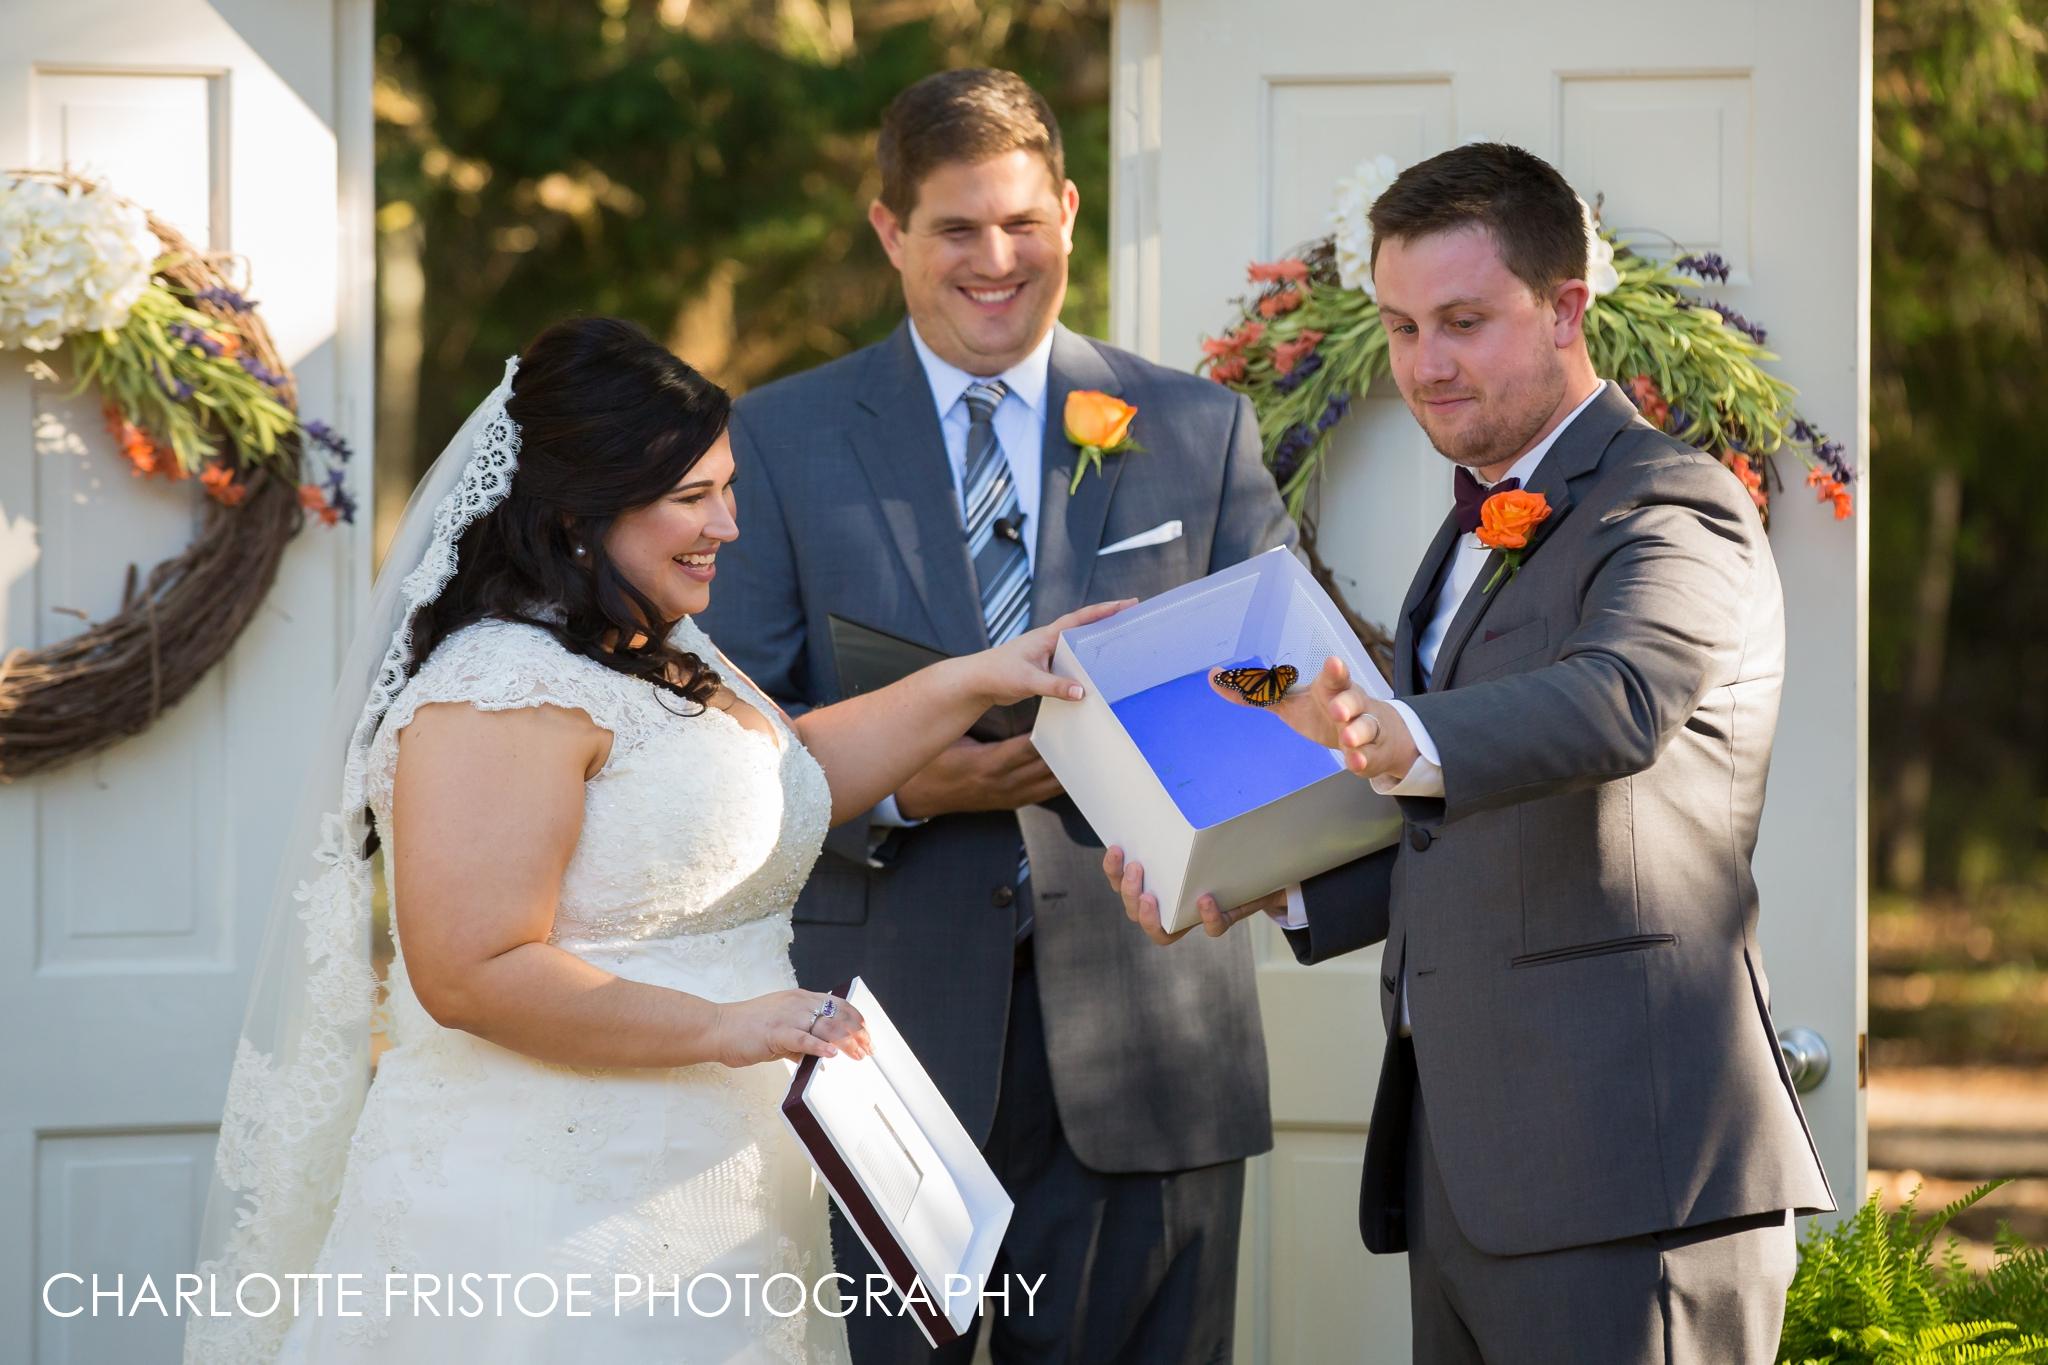 Lake Iamonia Wedding Charlotte Fristoe Photography-48.jpg